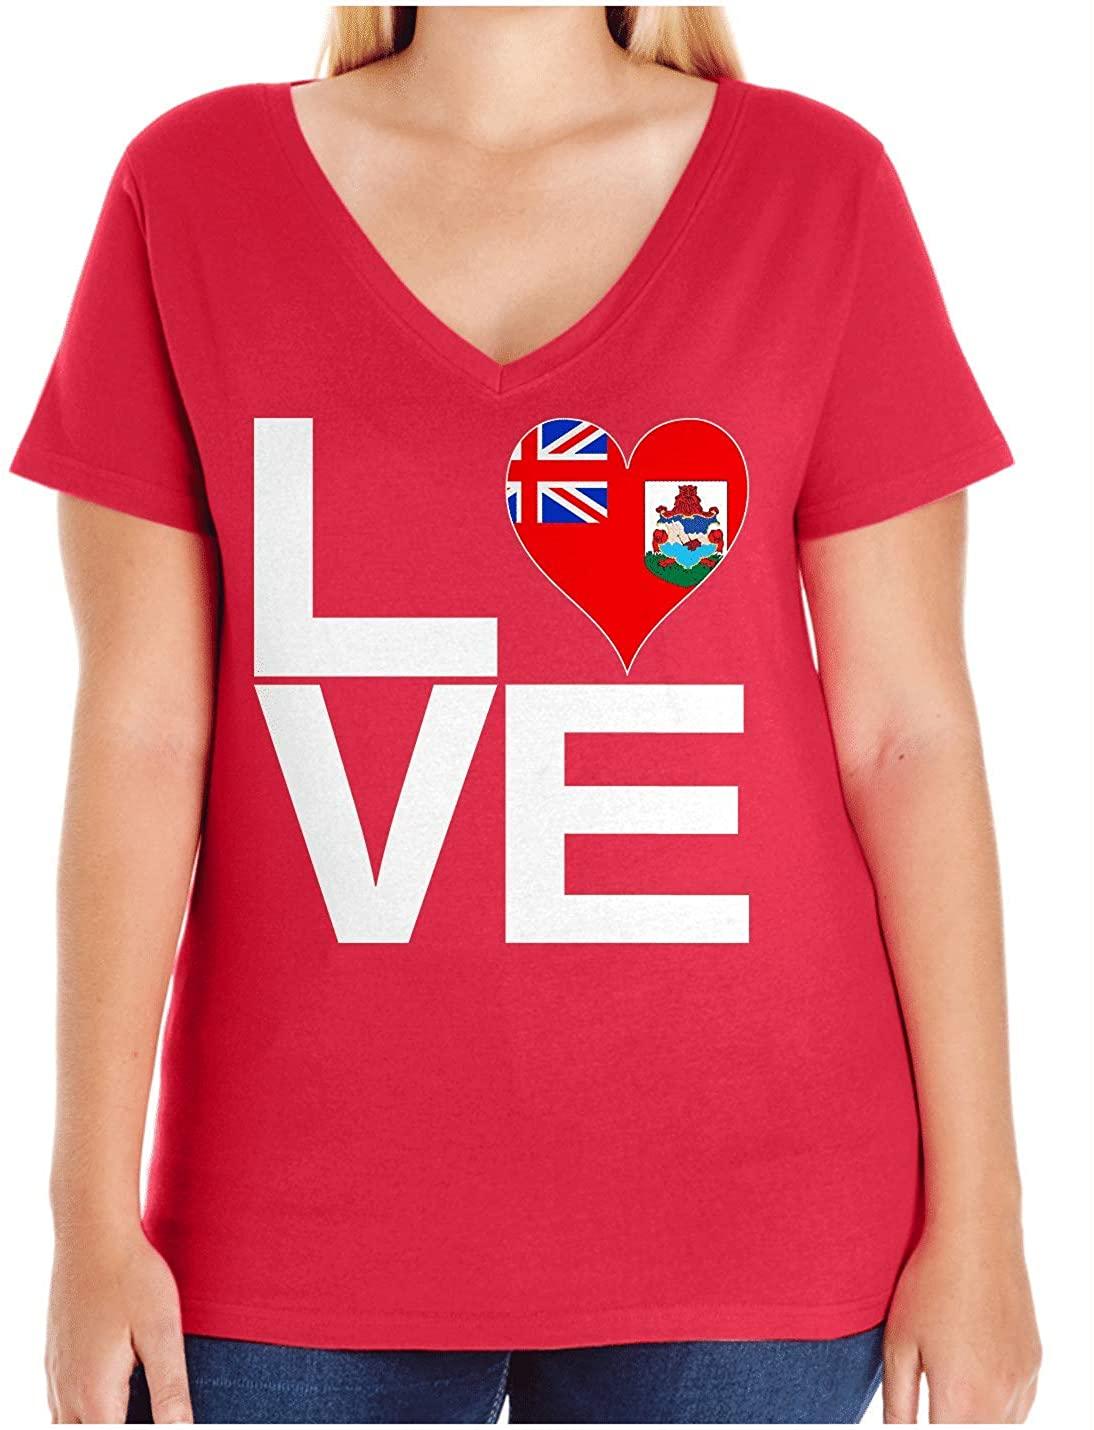 HARD EDGE DESIGN Women's Love Block Bermuda Heart Plus Size V Neck T-Shirt, Size 2, Red